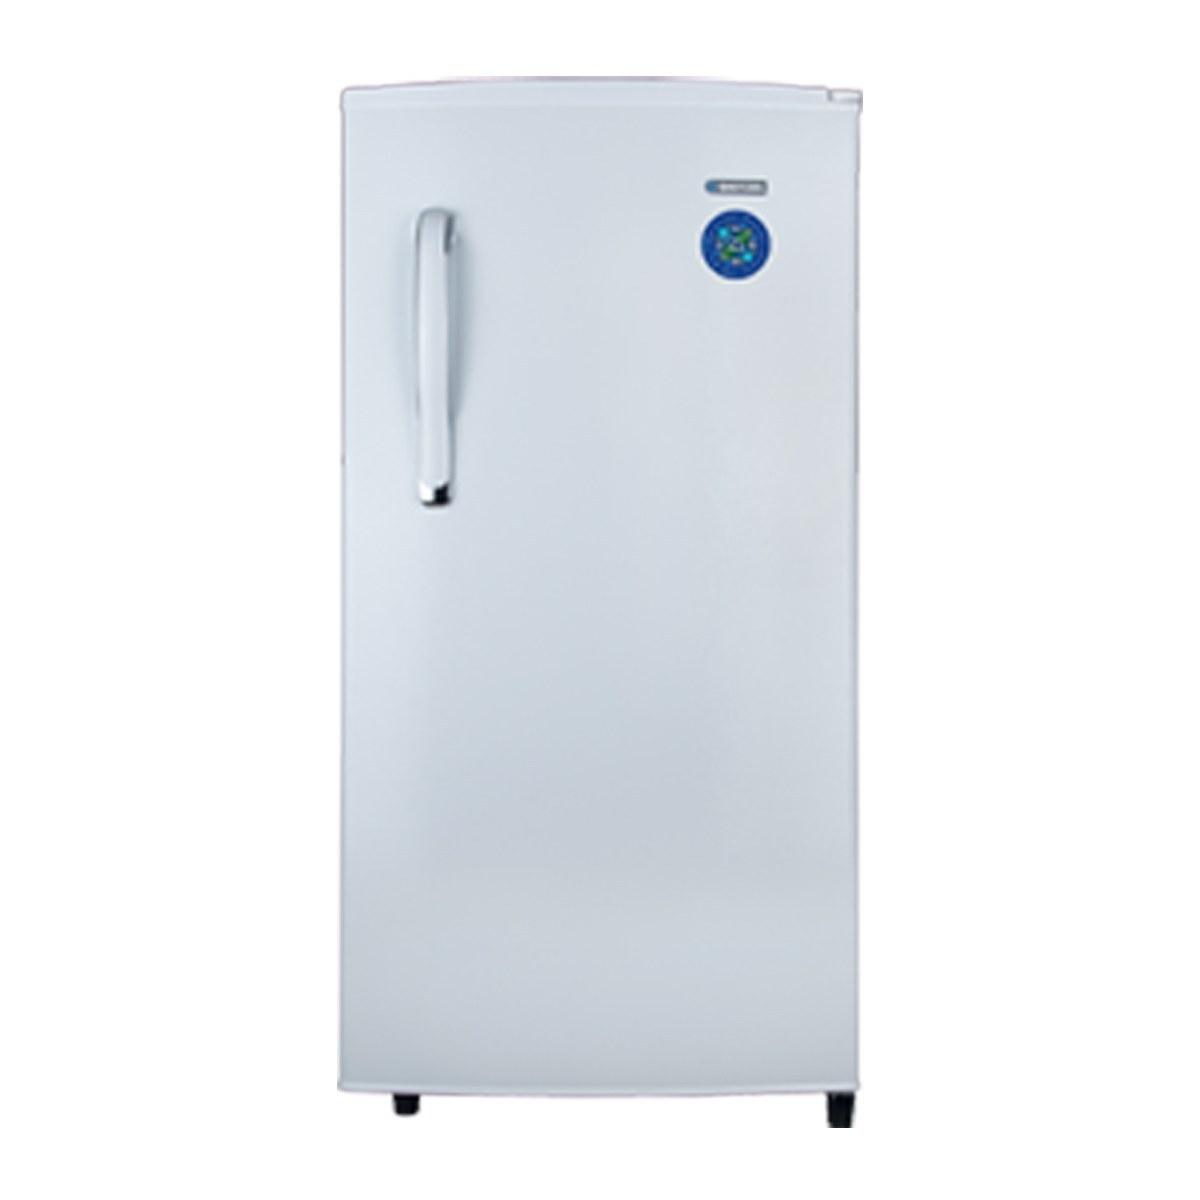 تصویر یخچال 9 فوت ایستکول مدل TM-638-150 EastCool Refrigerator TM-638-150